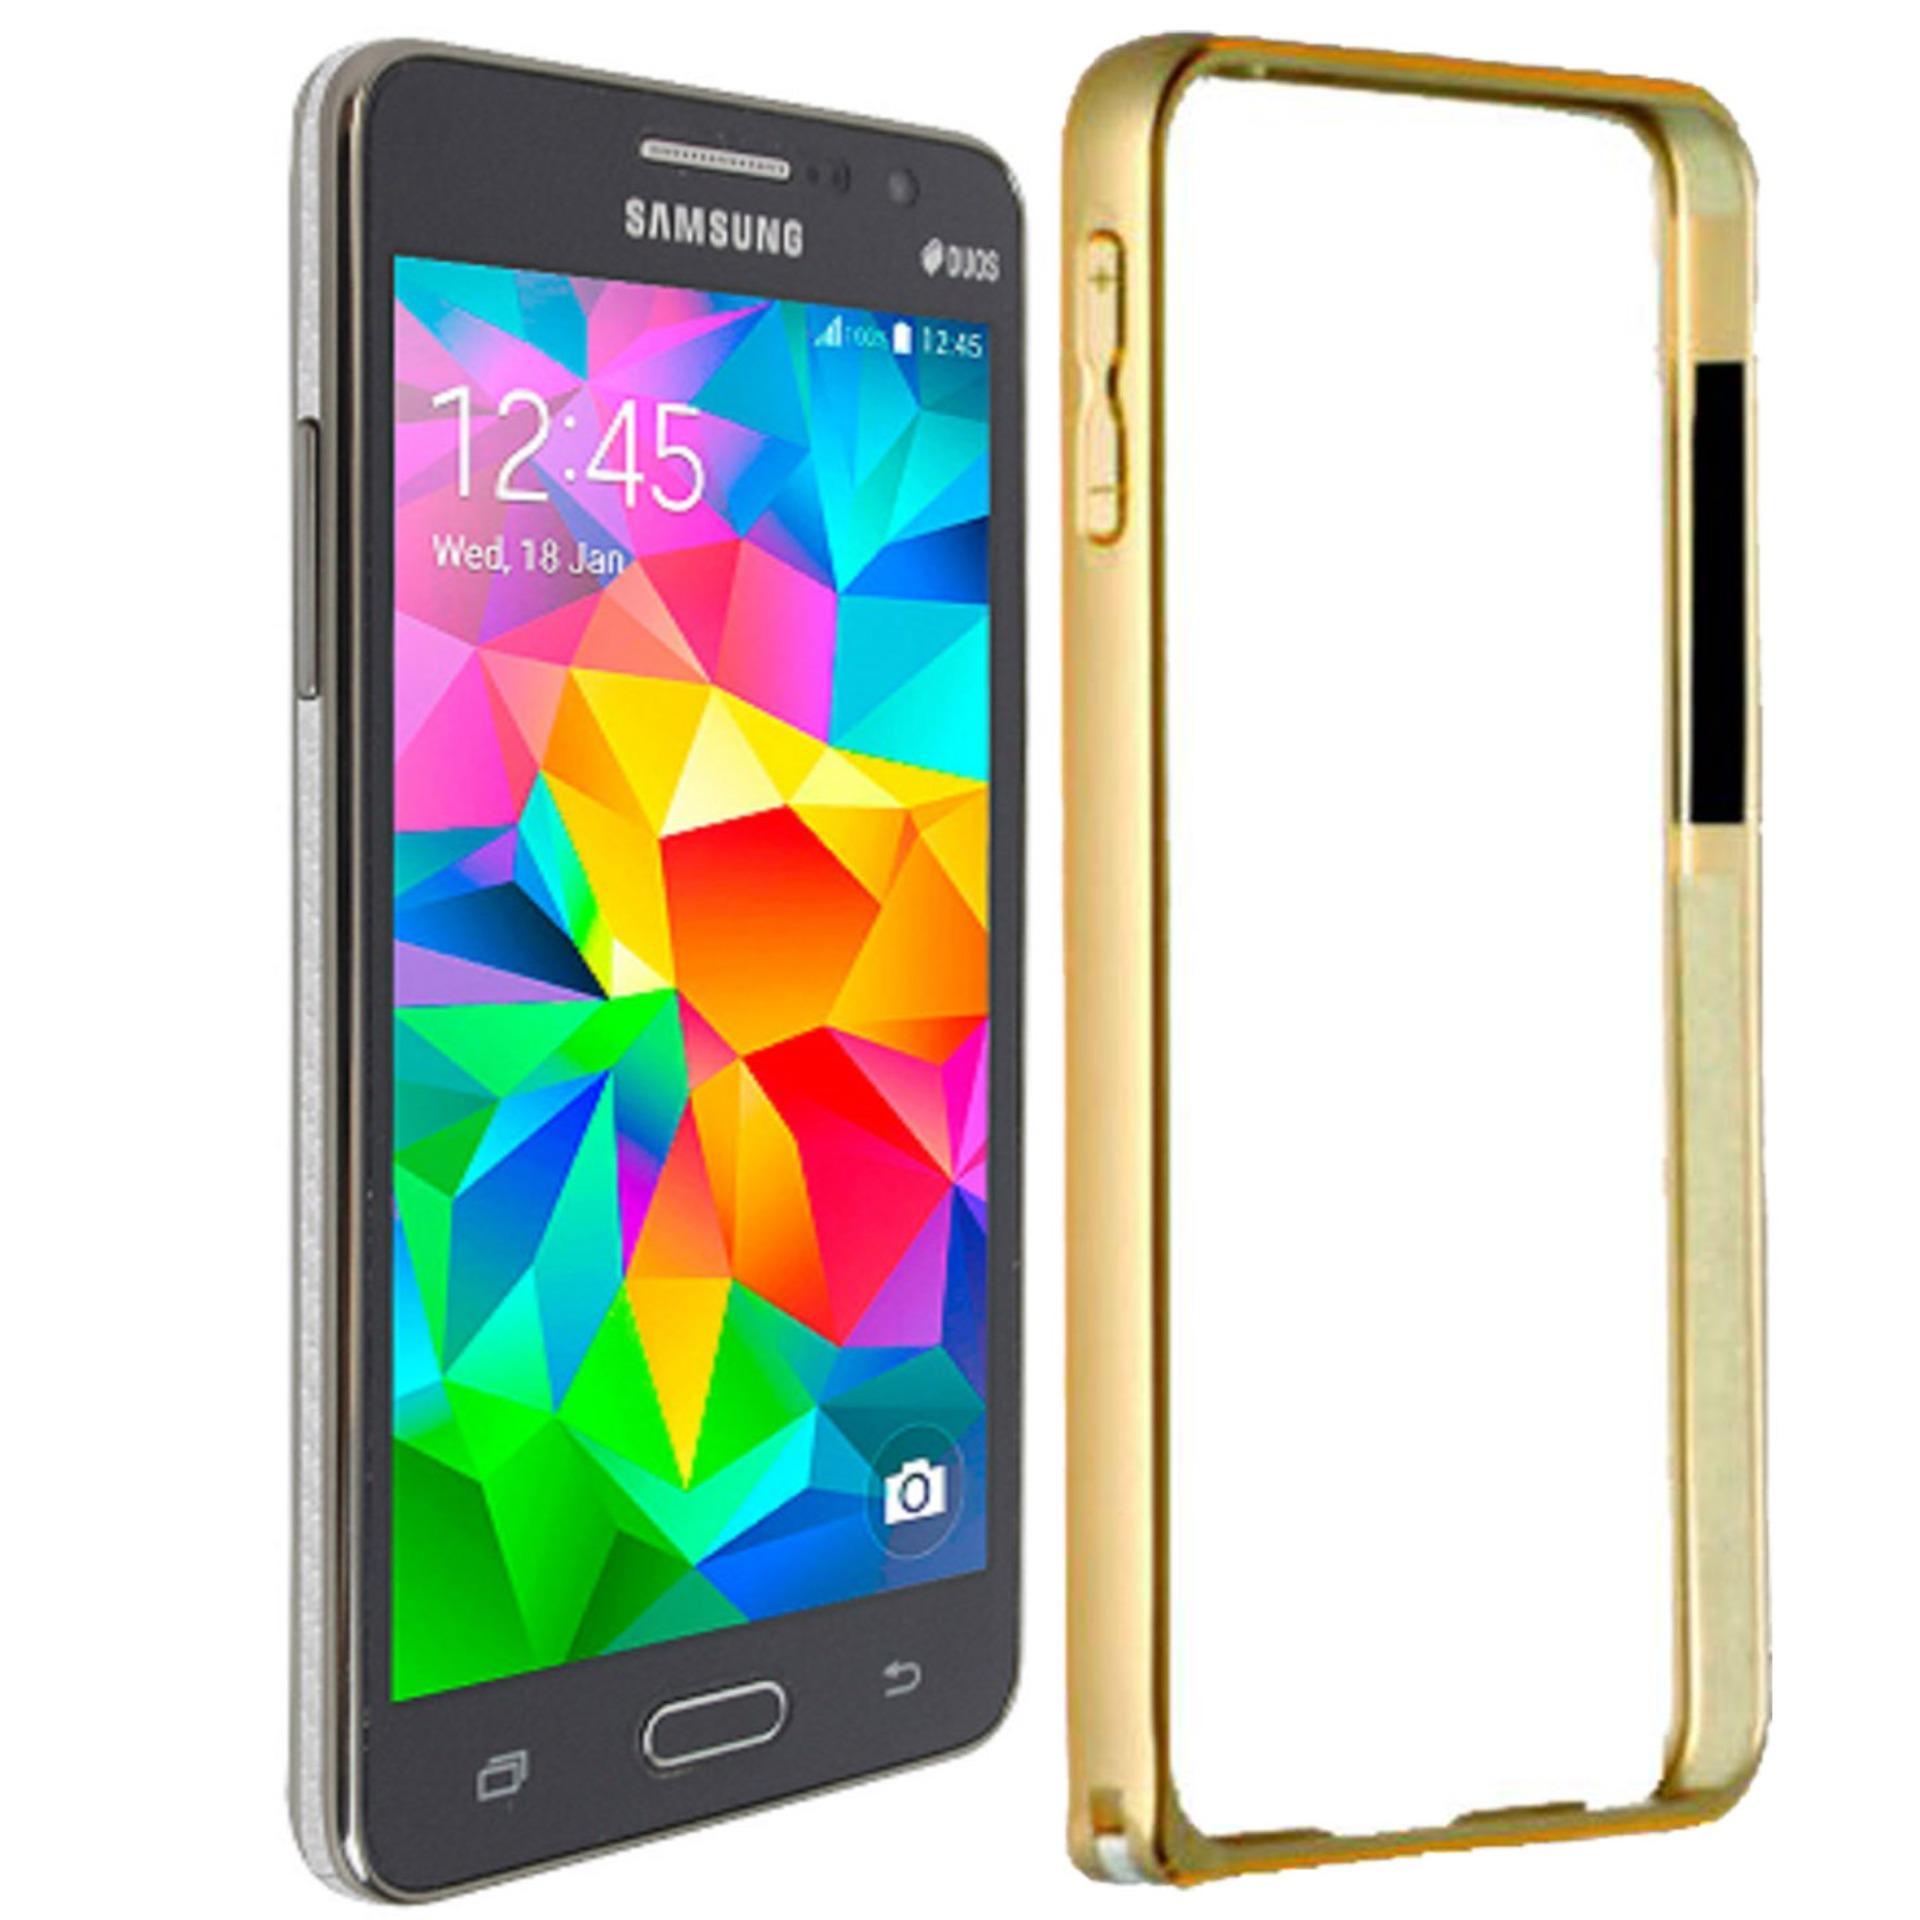 Aluminium Bumper Stainless Metal Bezel List for Samsung Galaxy Grand Prime G350 Prime